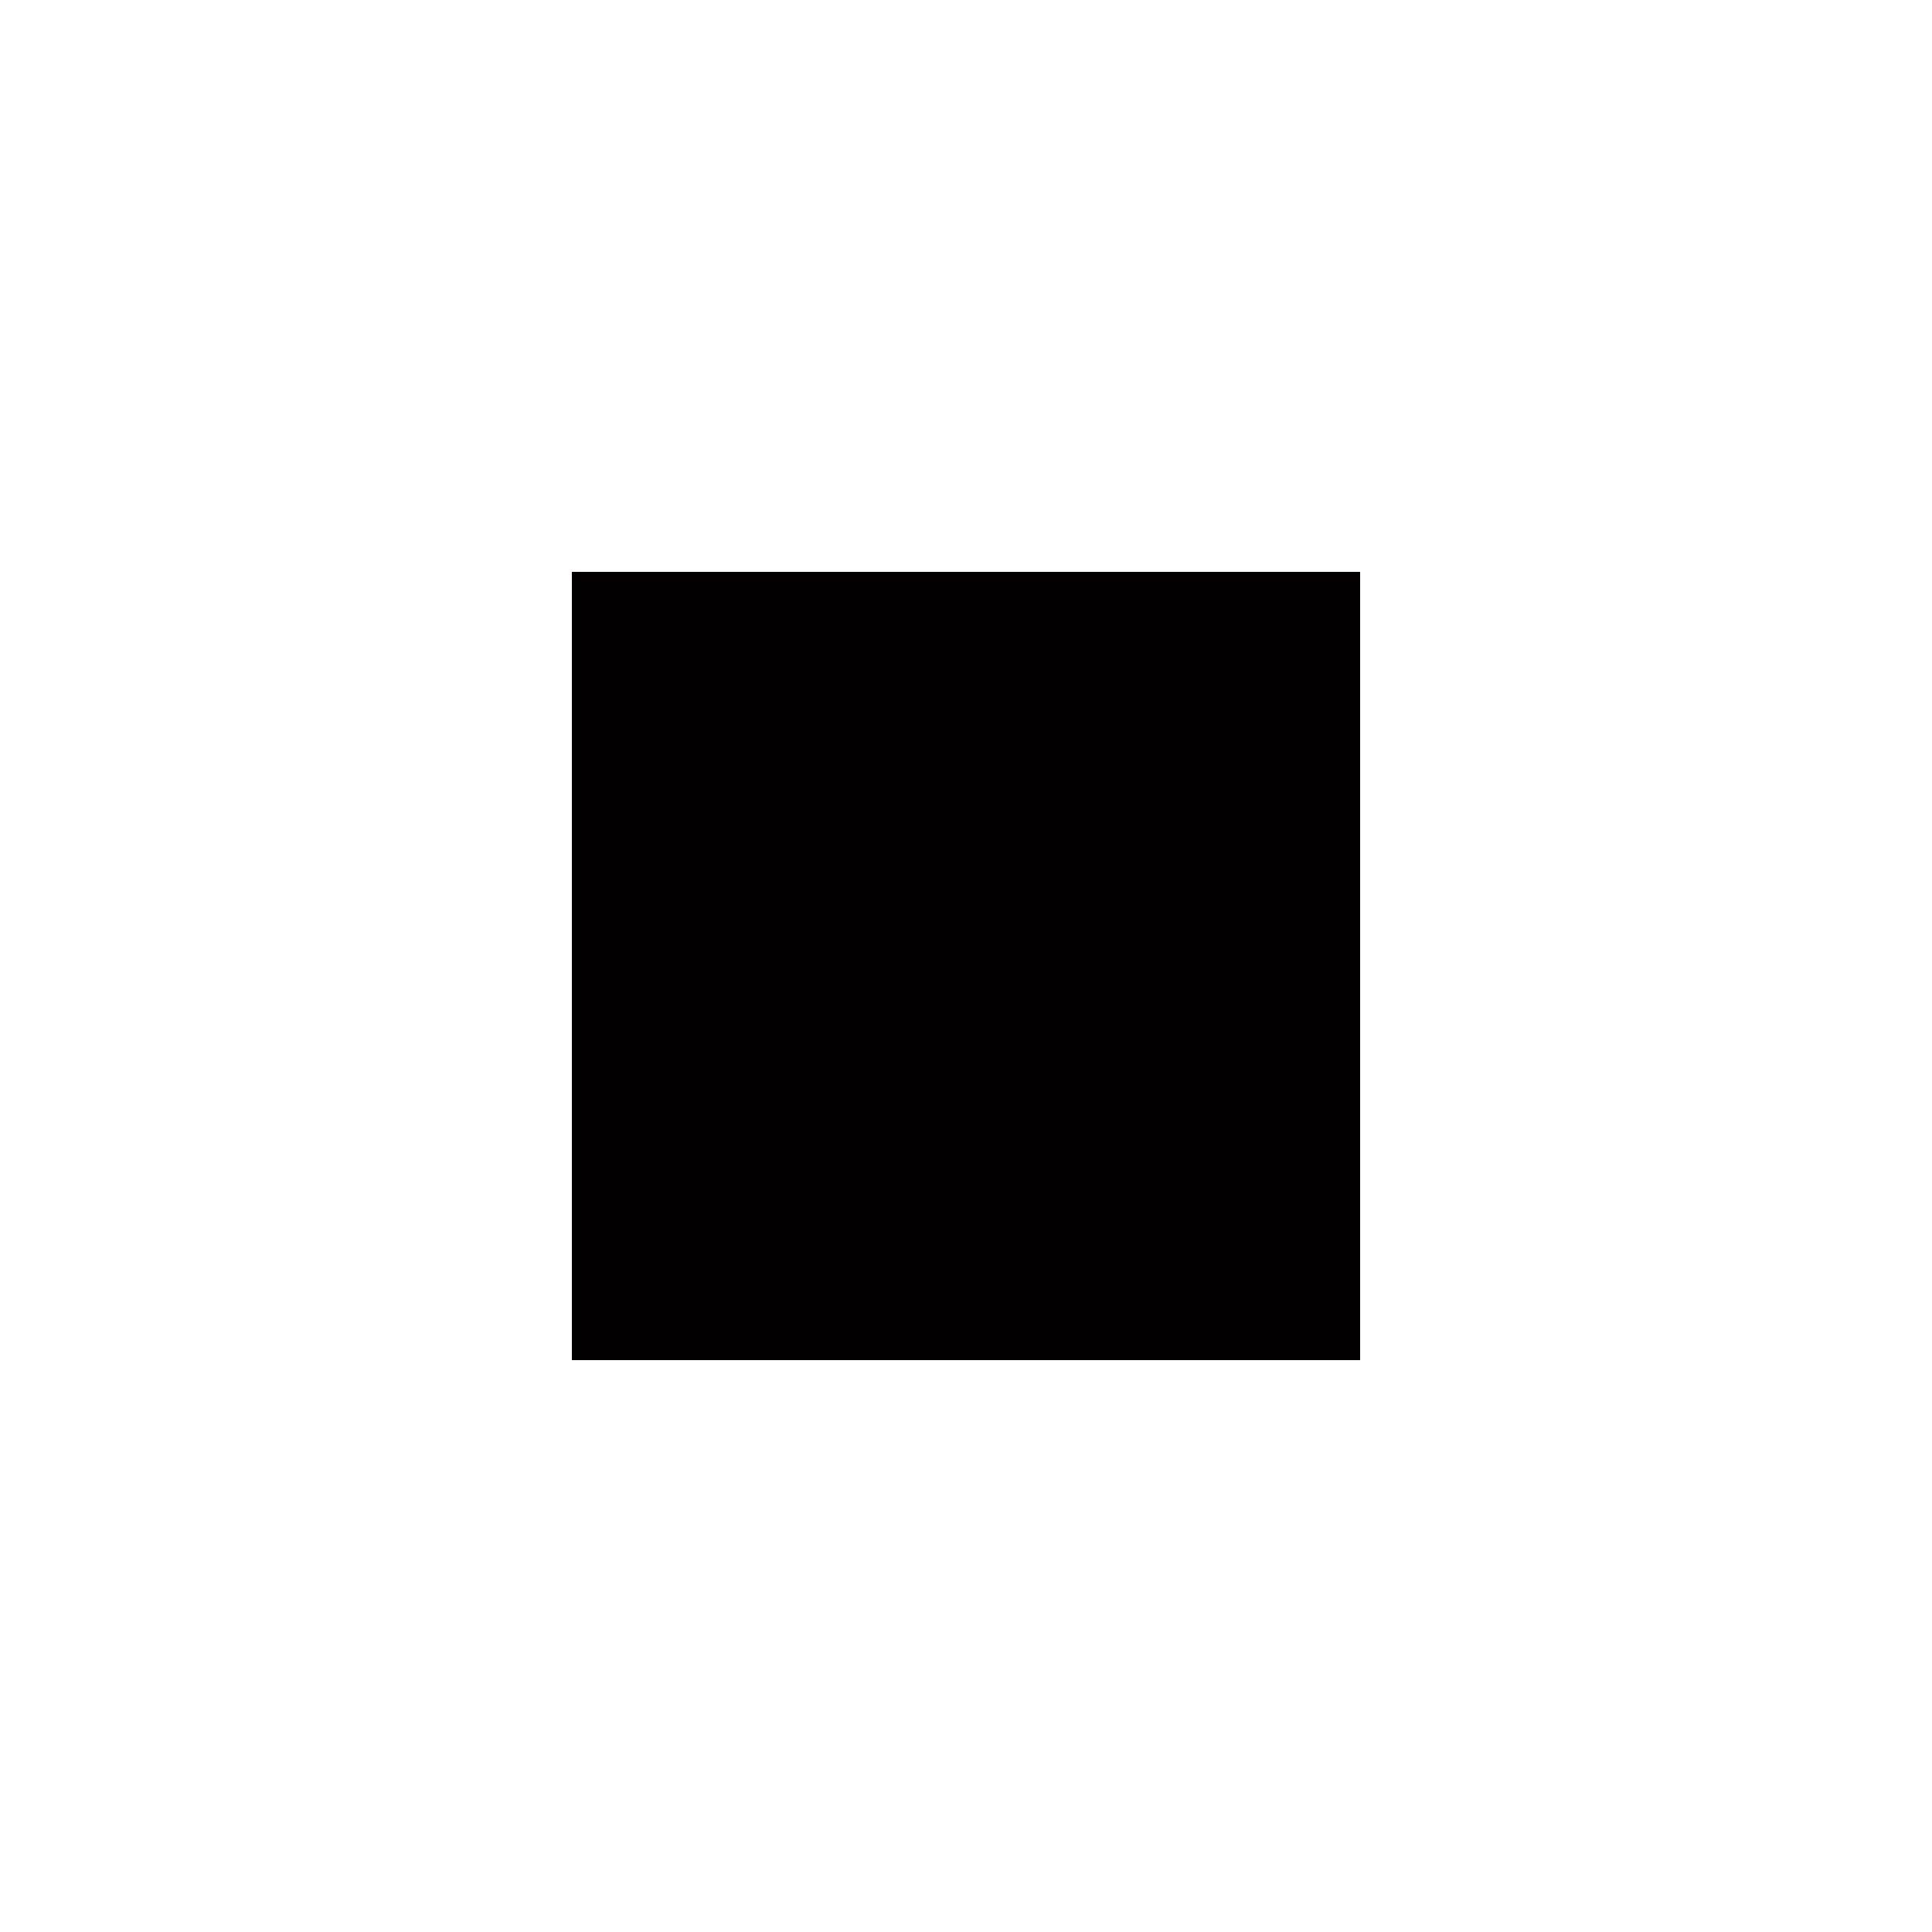 Staedtler 313-9 Lumocolor Universal Permanent Superfine Pens - Black, Pack of 10 by Staedtler Mars GmbH & Co. (Image #6)